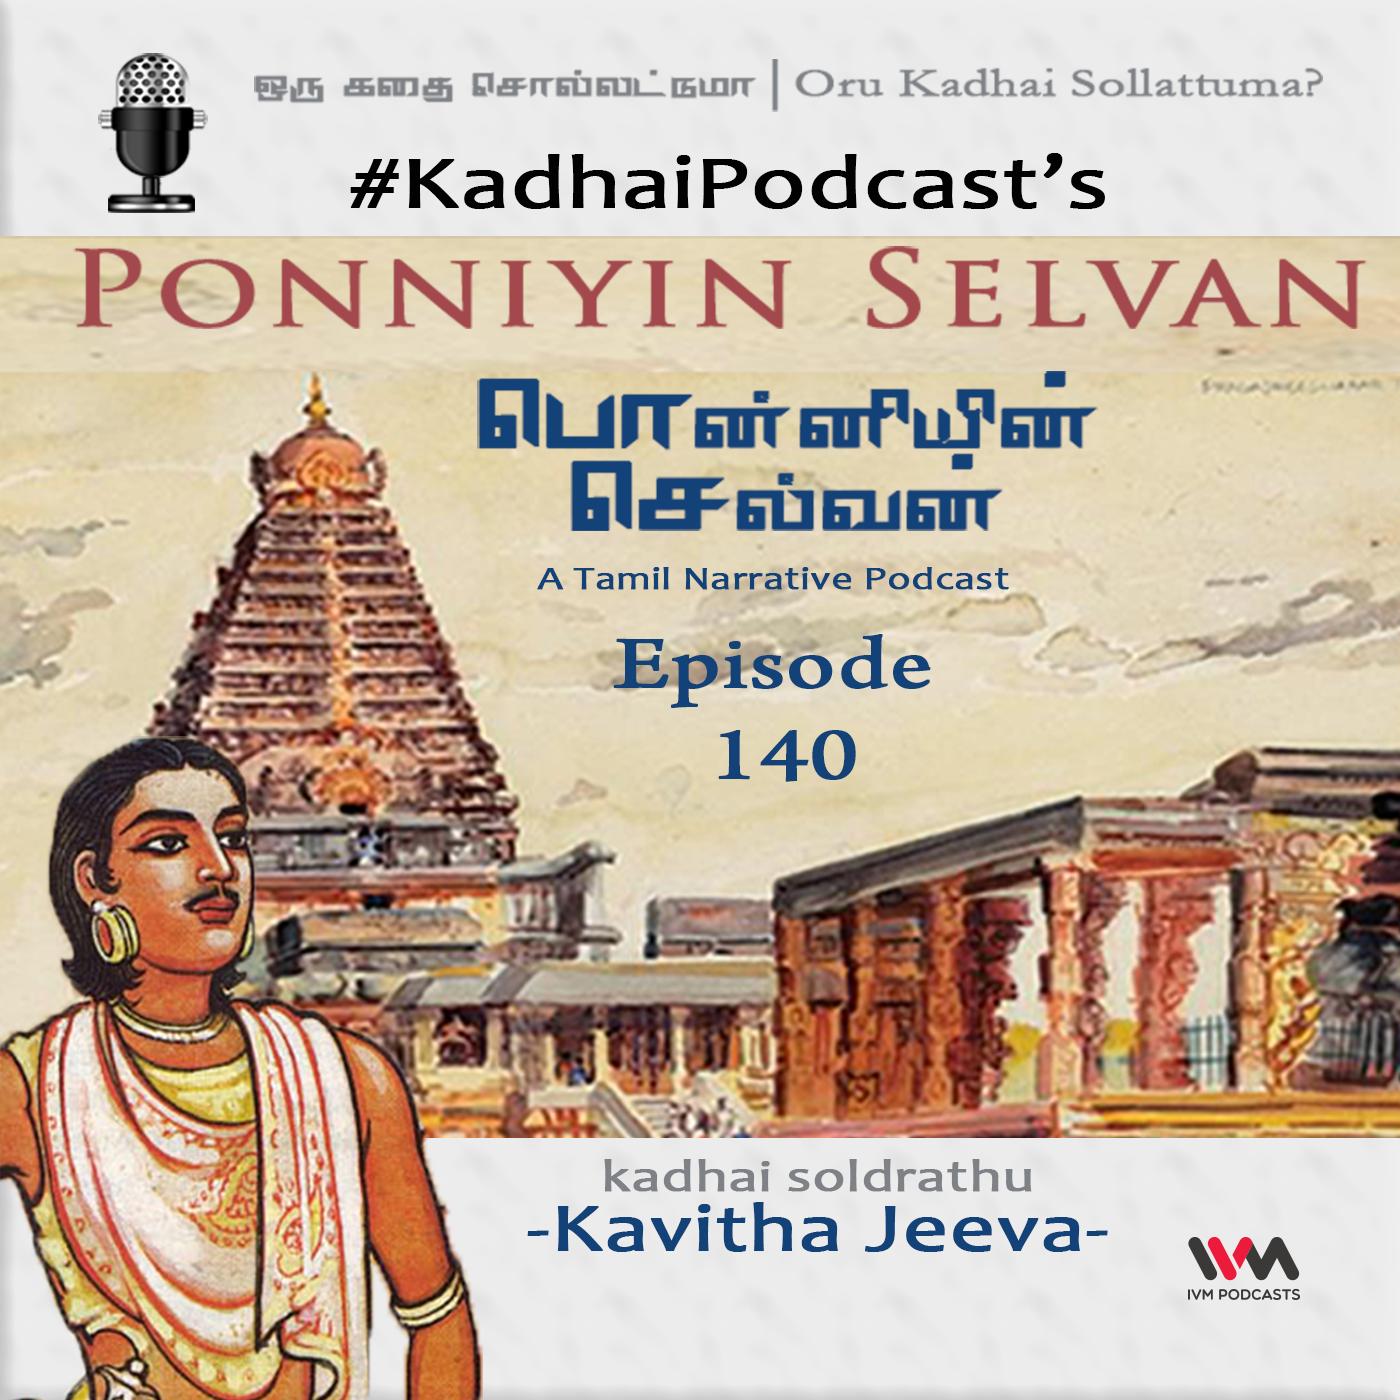 KadhaiPodcast's Ponniyin Selvan - Episode # 140